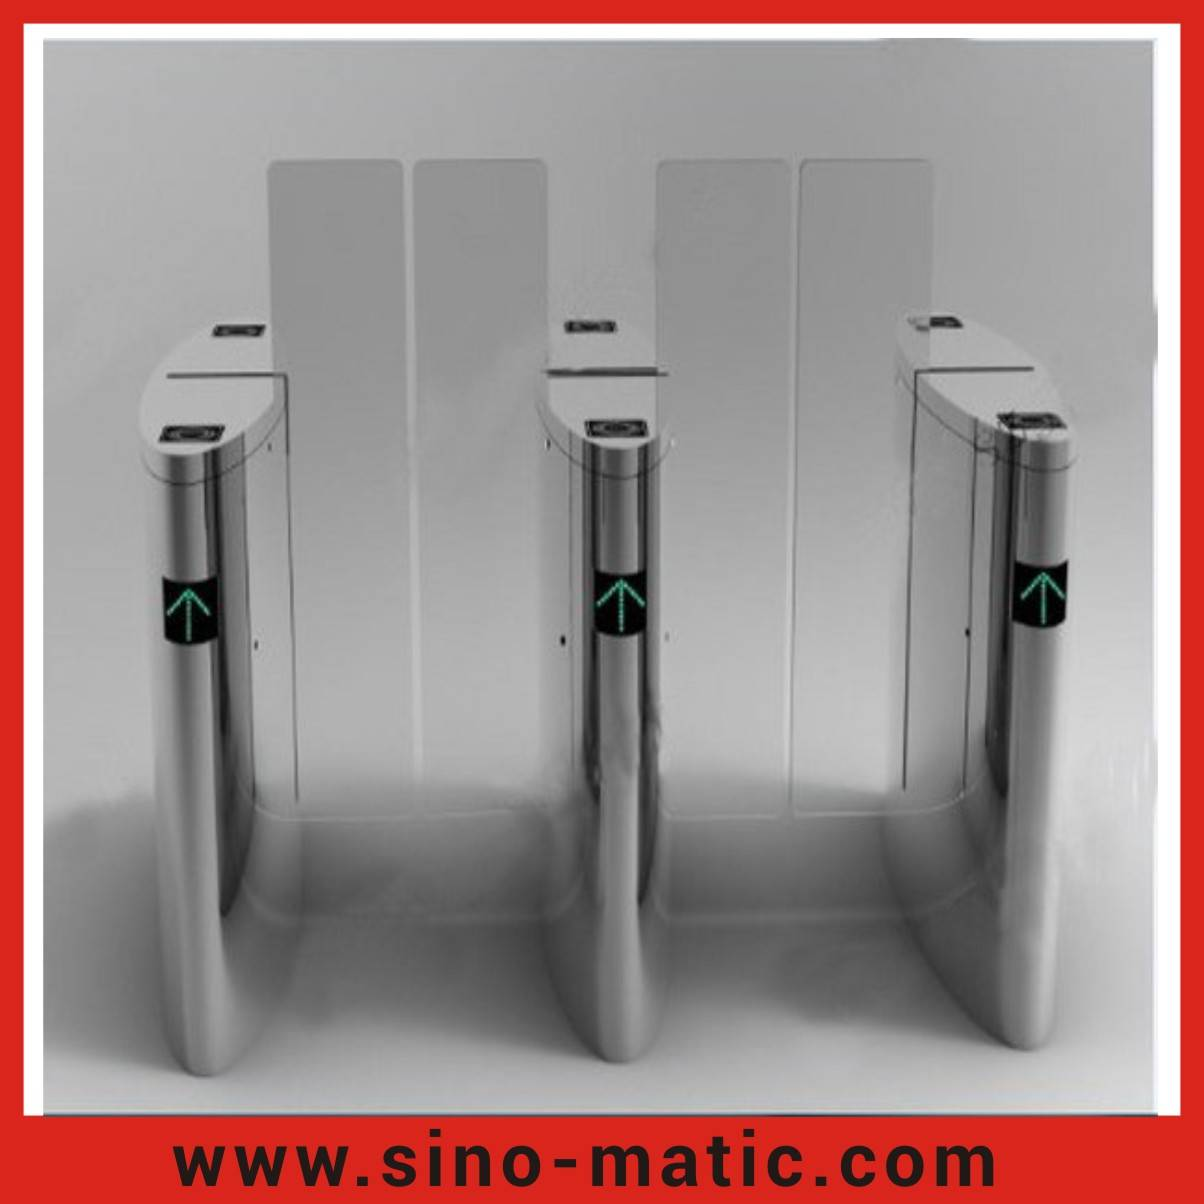 Stainless Steel Pedestriam RFID Reader Access Control Sliding Barrier